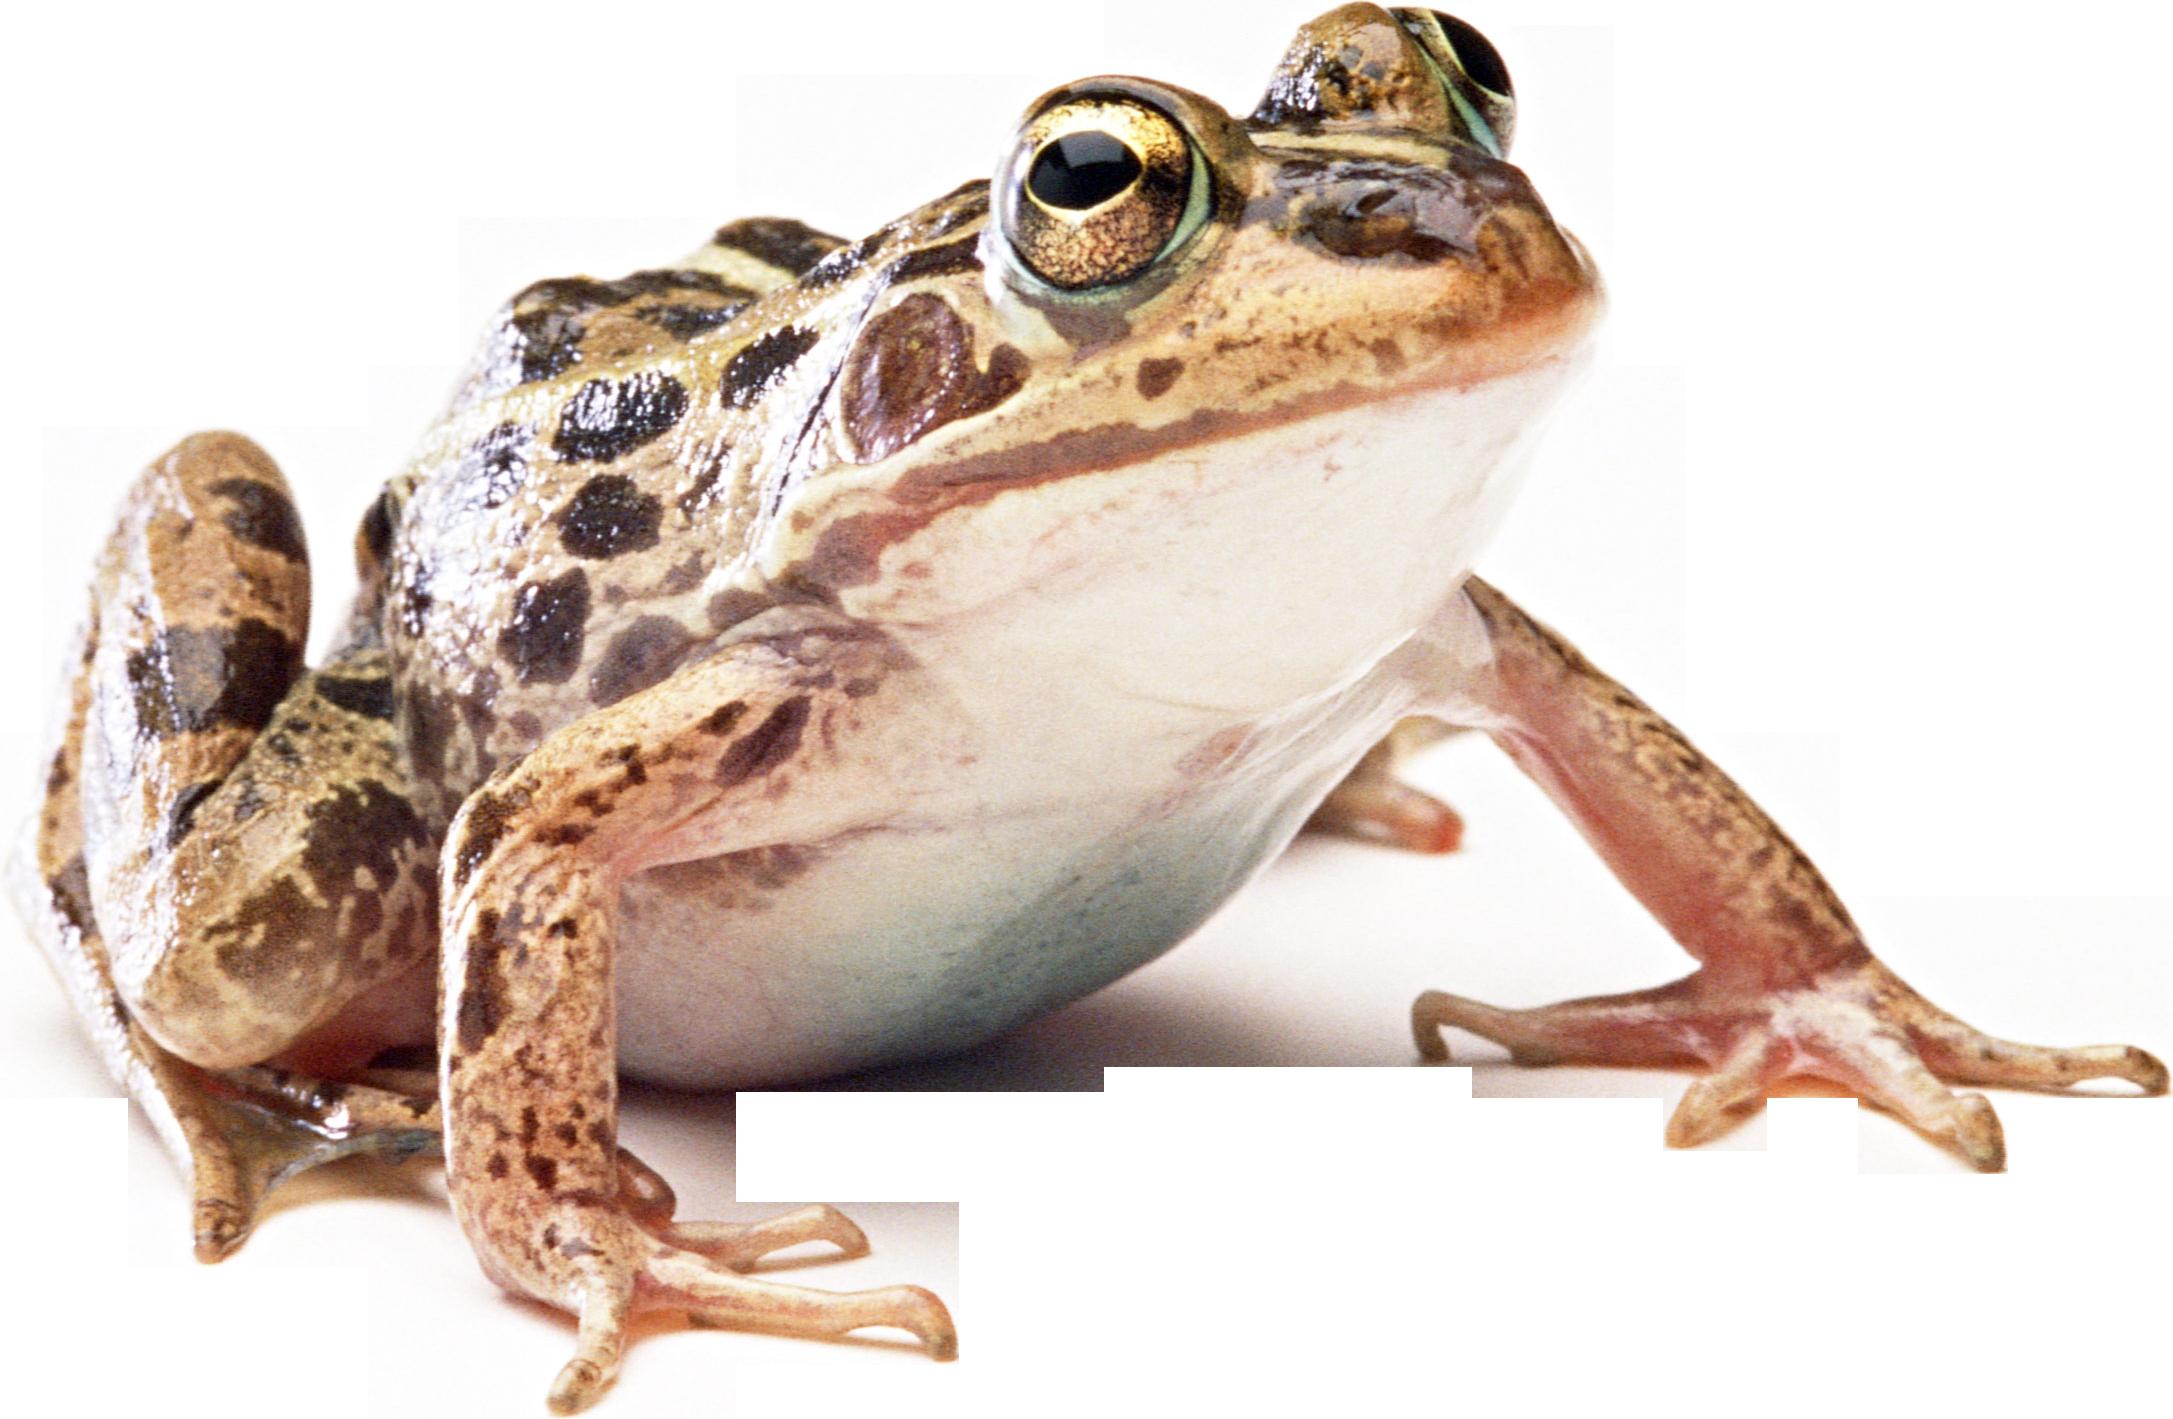 Download PNG image: frog PNG image - Frog PNG HD